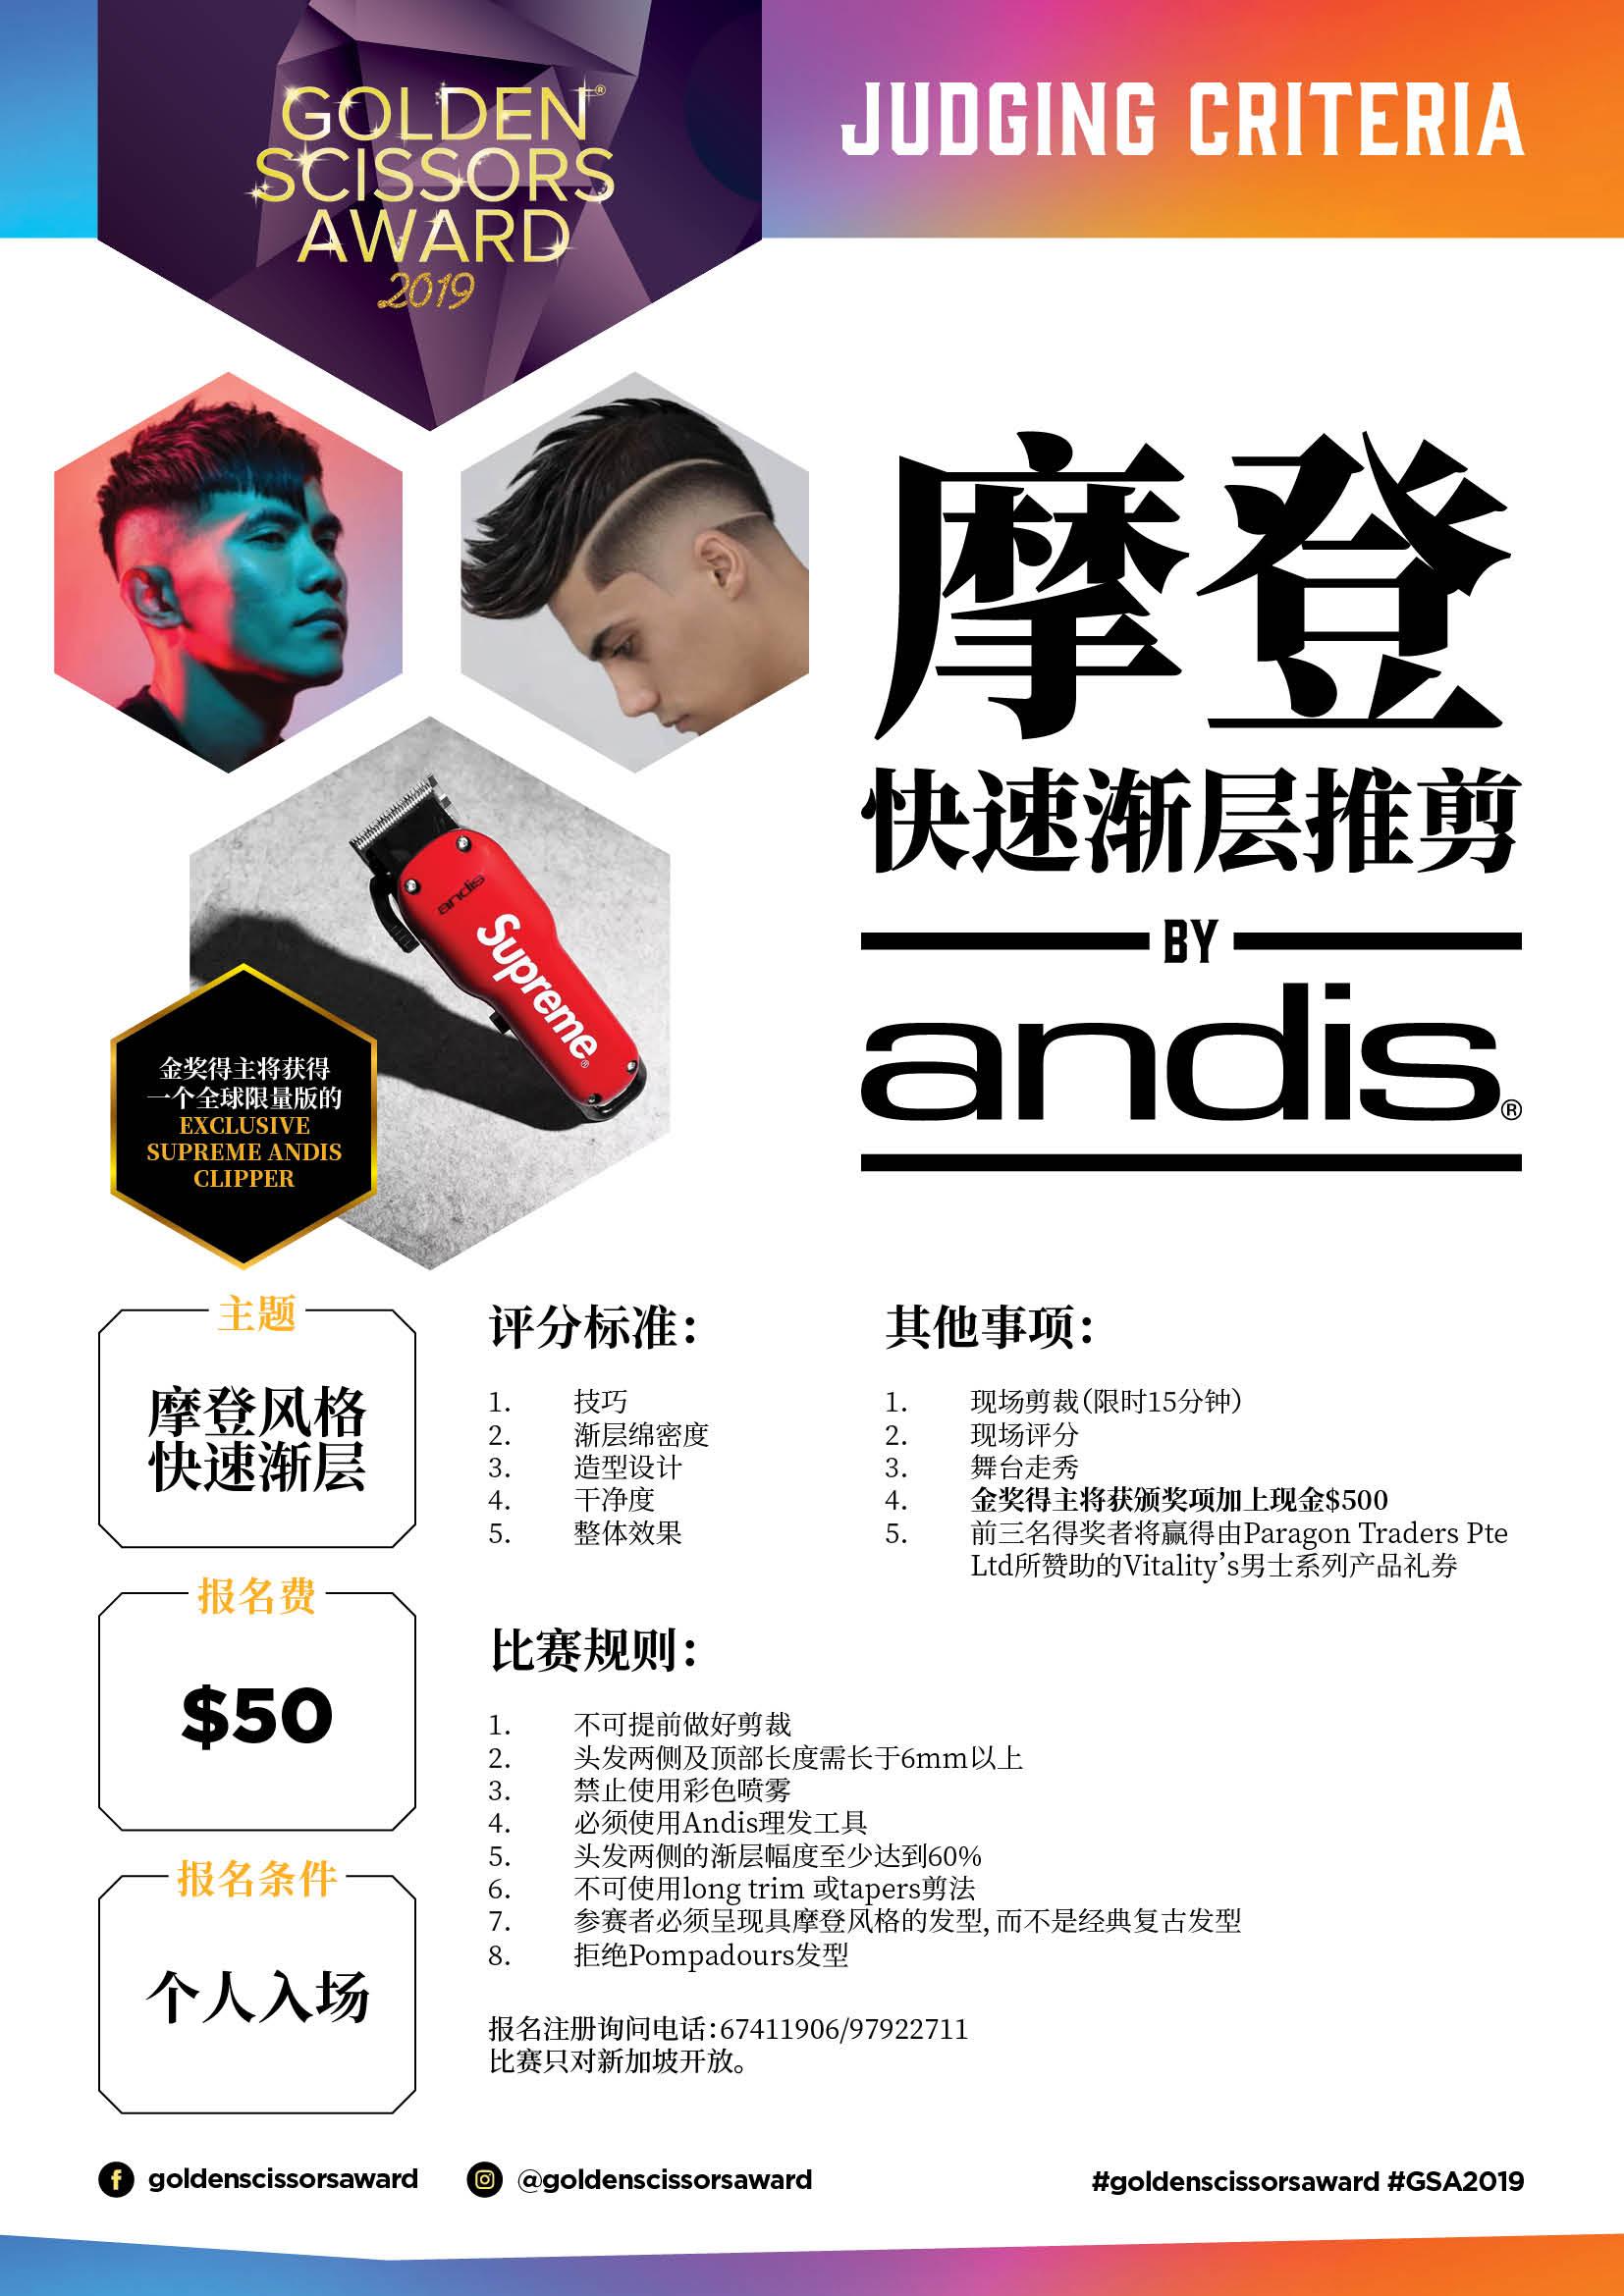 Golden Scissors Award Judging Criteria Chinese